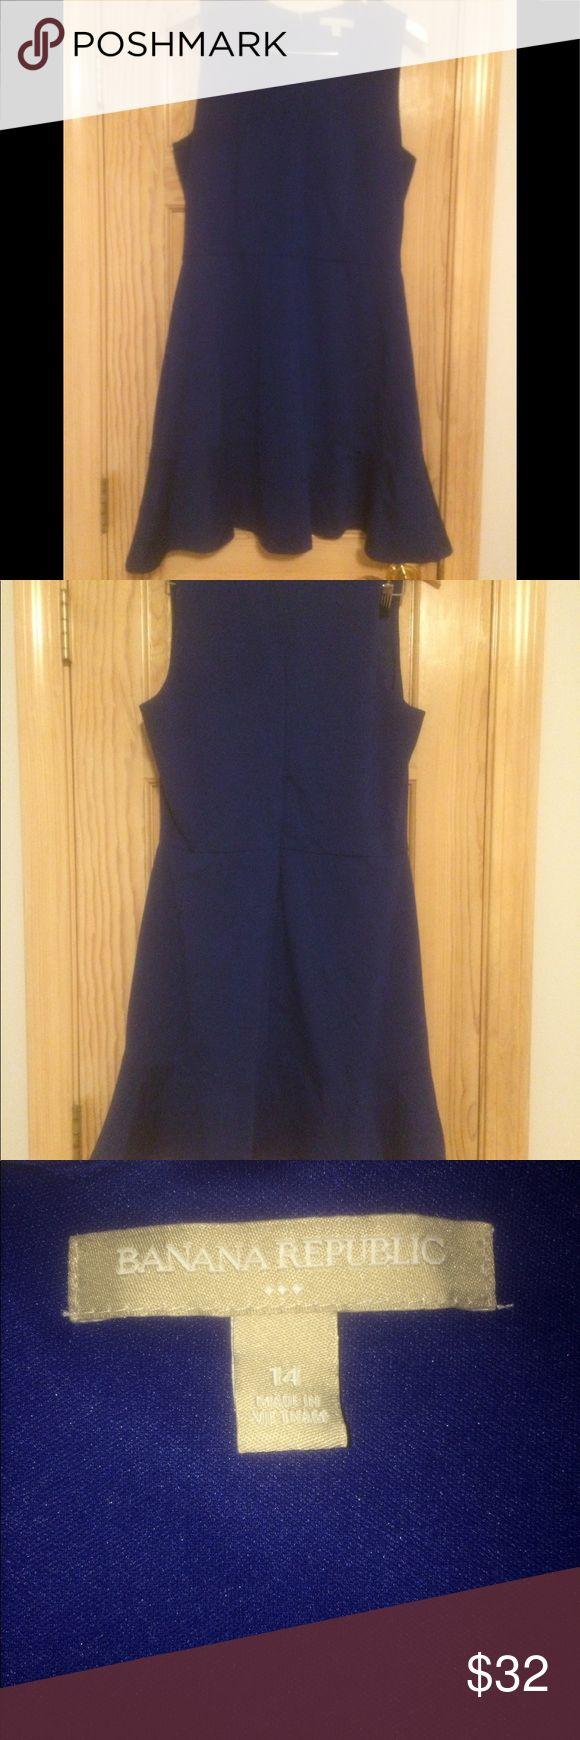 Royal Blue Banana Republic Fit n' Flare Dress This classic royal blue Banana Republic Fit n' Flare dress is perfect for work or play. Banana Republic Dresses Midi